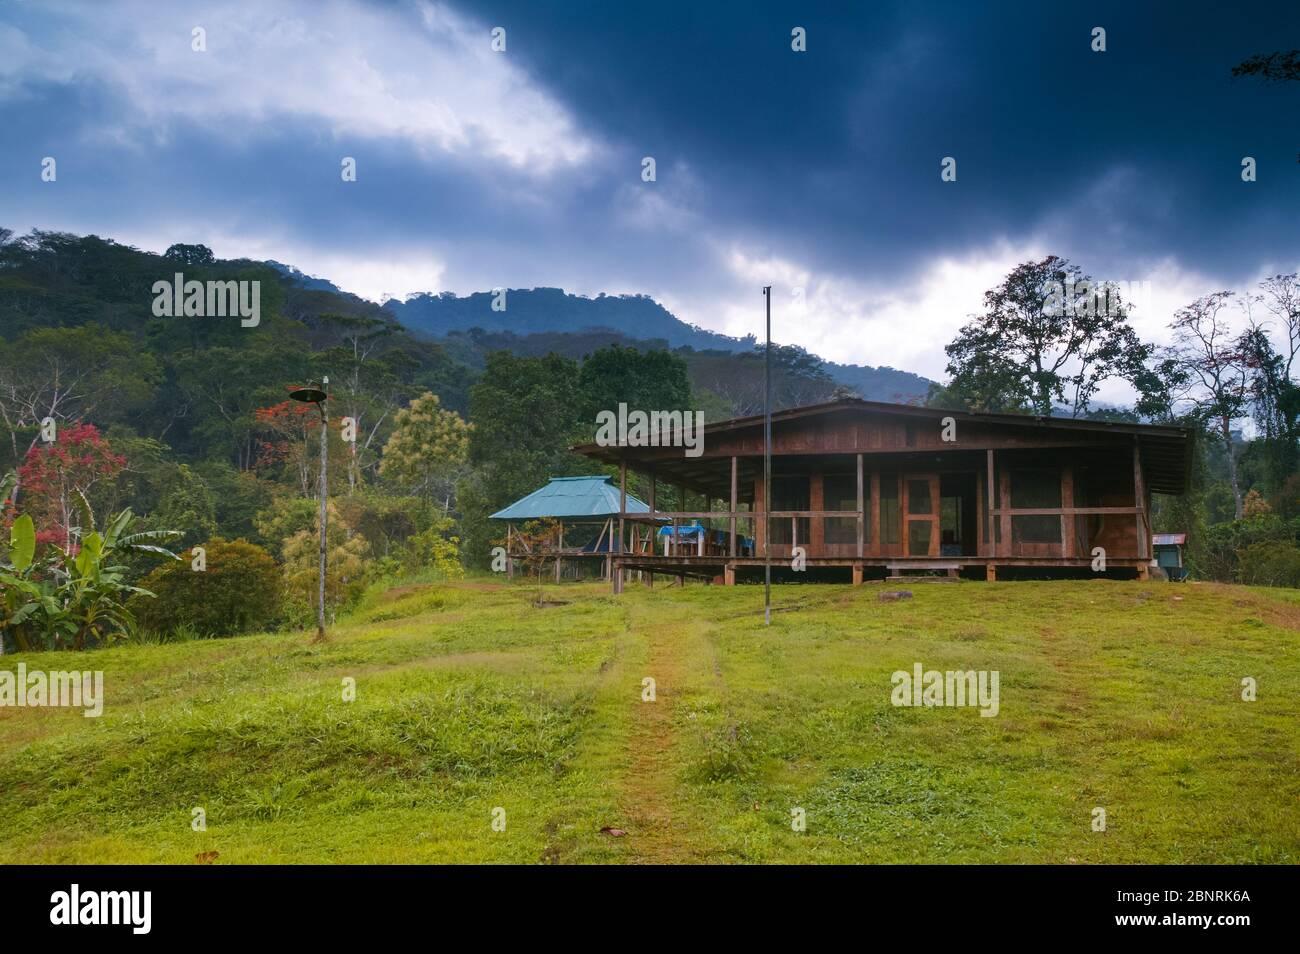 House at Cana field station, Darien national park, Darien province, Republic of Panama. Stock Photo